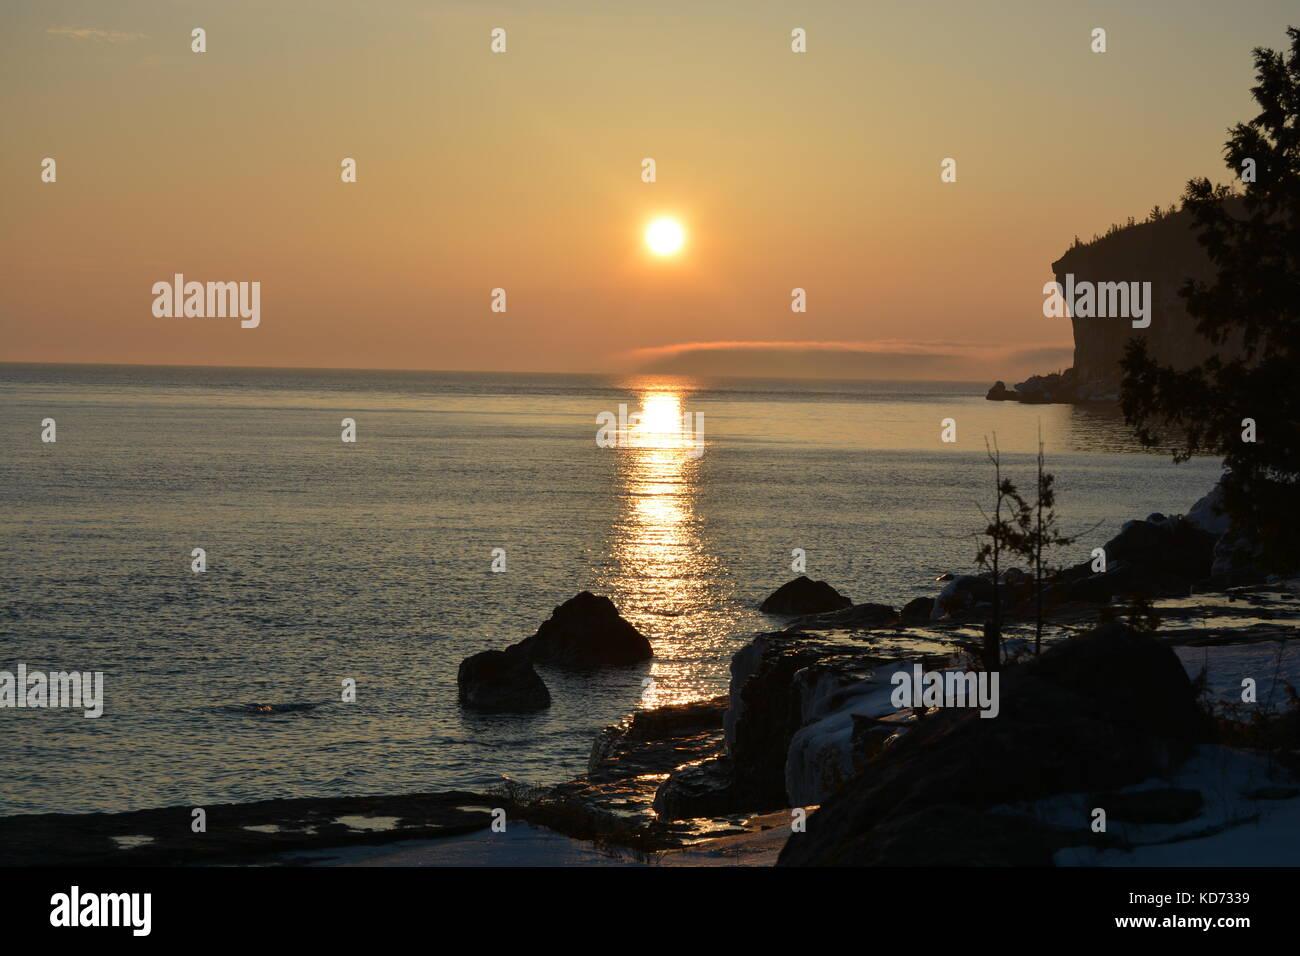 Atardecer en la península de Bruce, tobermory Foto de stock